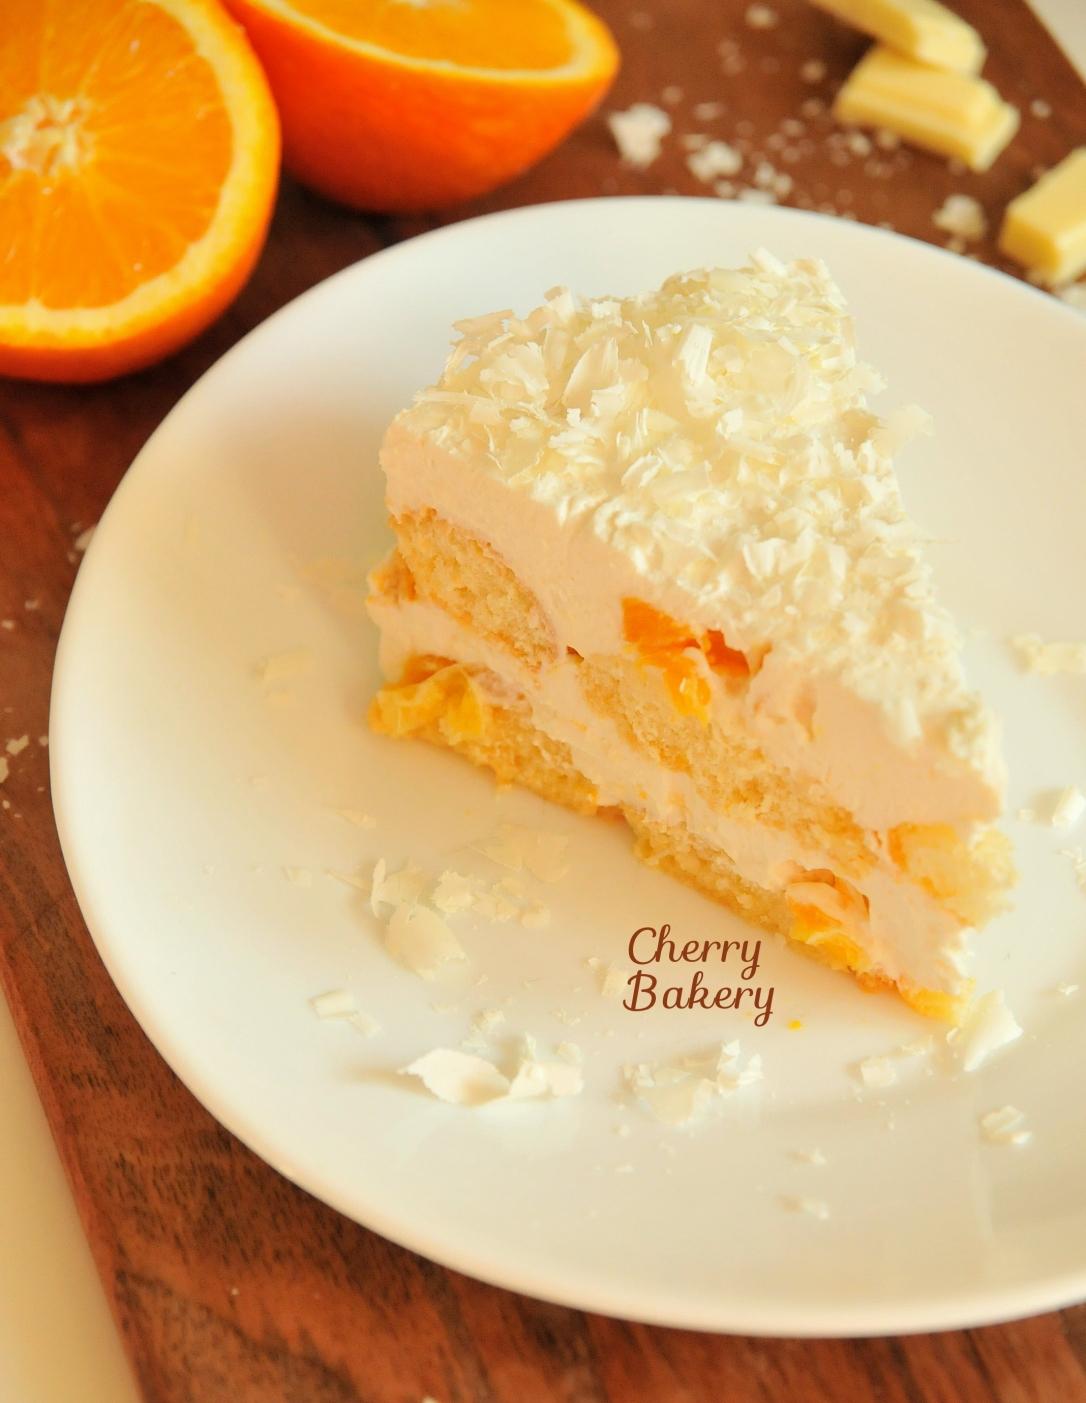 Сочна бишкотена торта с портокали от Cherry Bakery